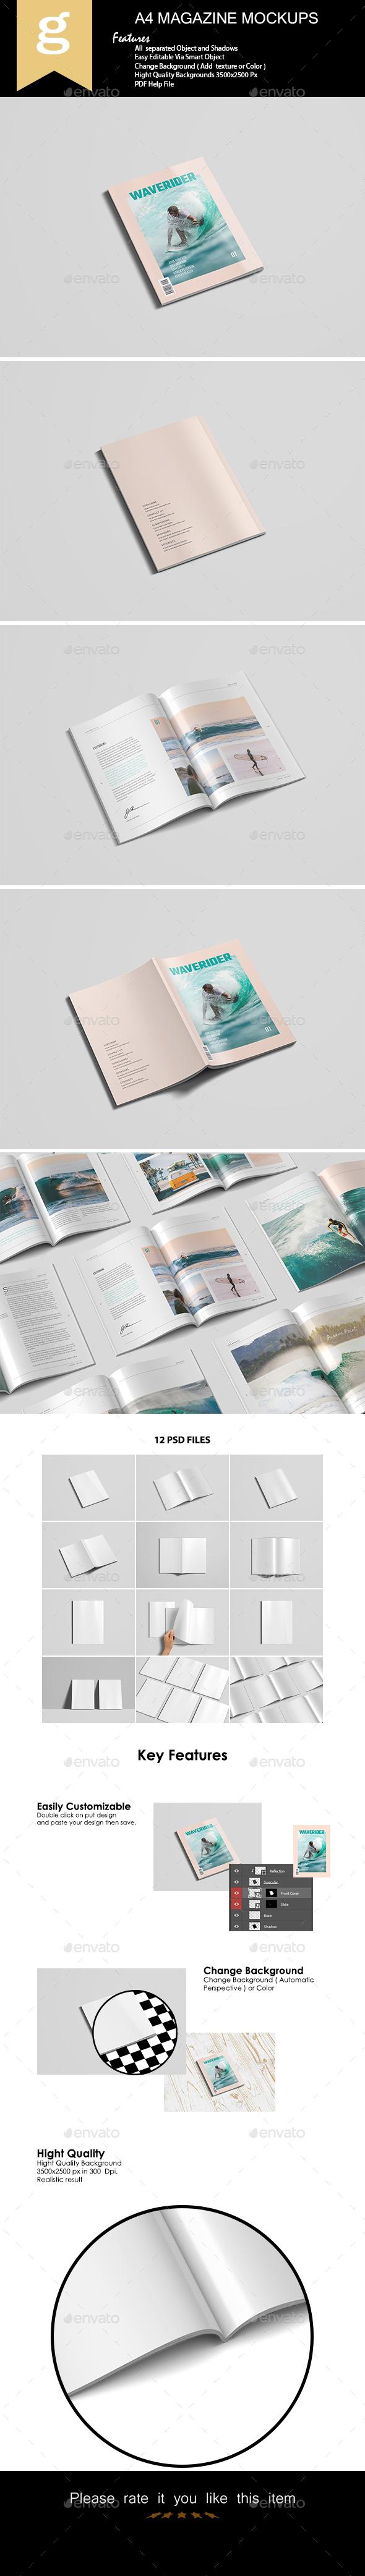 A4 Magazine Mock-Up - Magazines Print